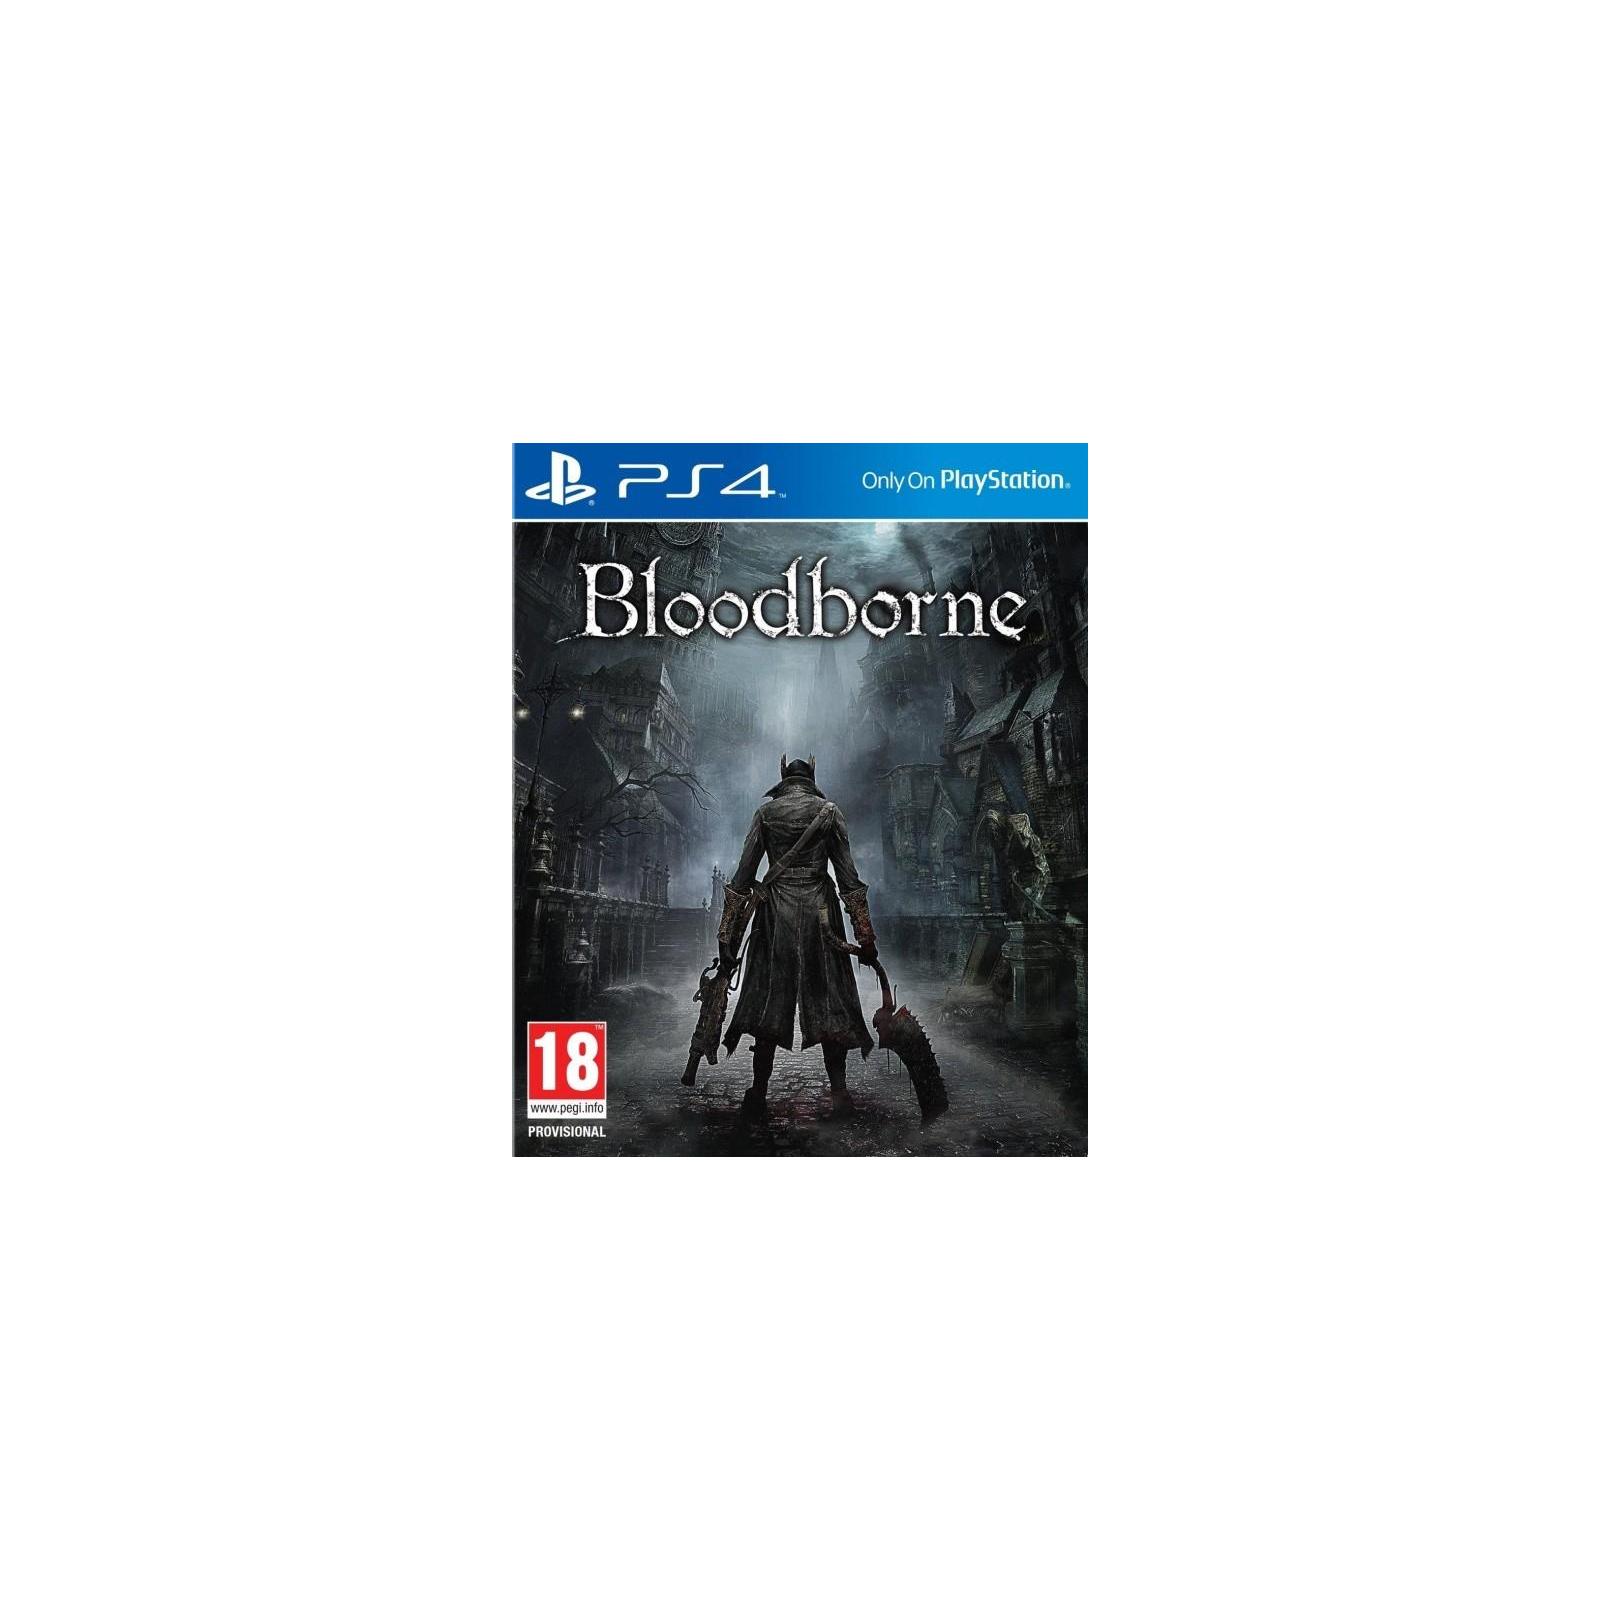 Игра SONY Bloodborne[PS4,Russiansubtitles]Blu-rayдиск (9438472)